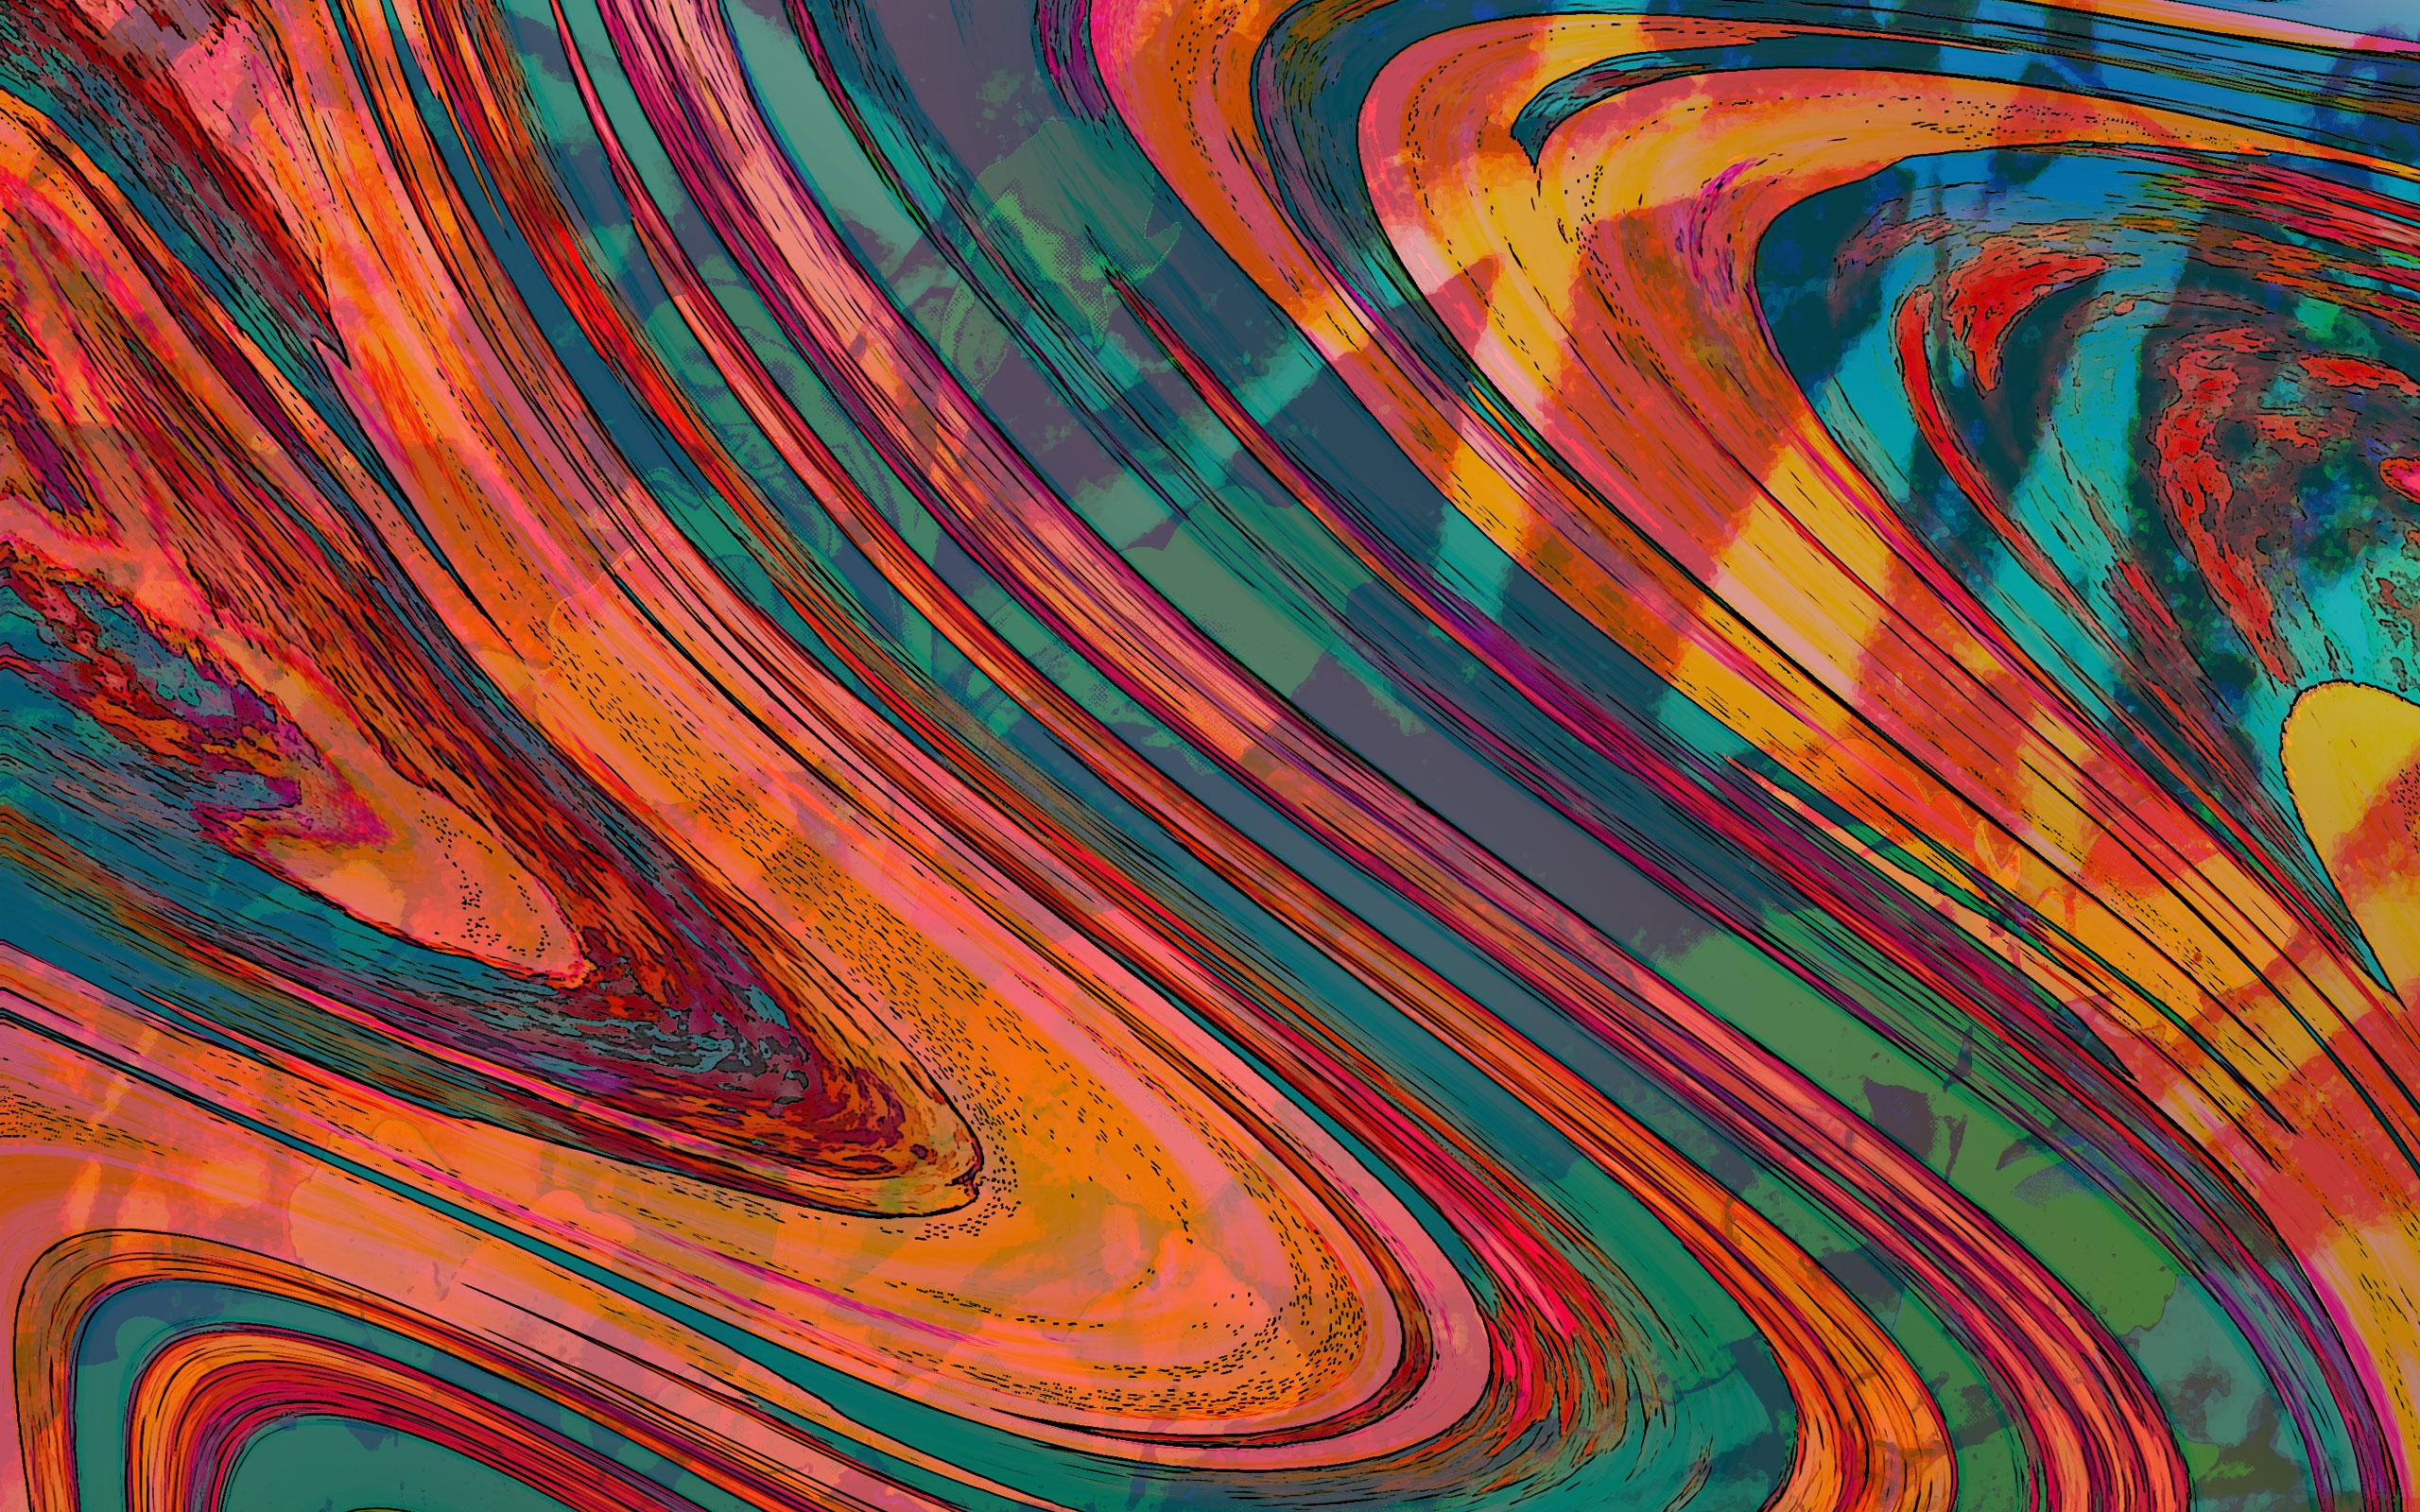 Popsicle Wallpaper Set, May - Retro Desktop Backgrounds - HD Wallpaper